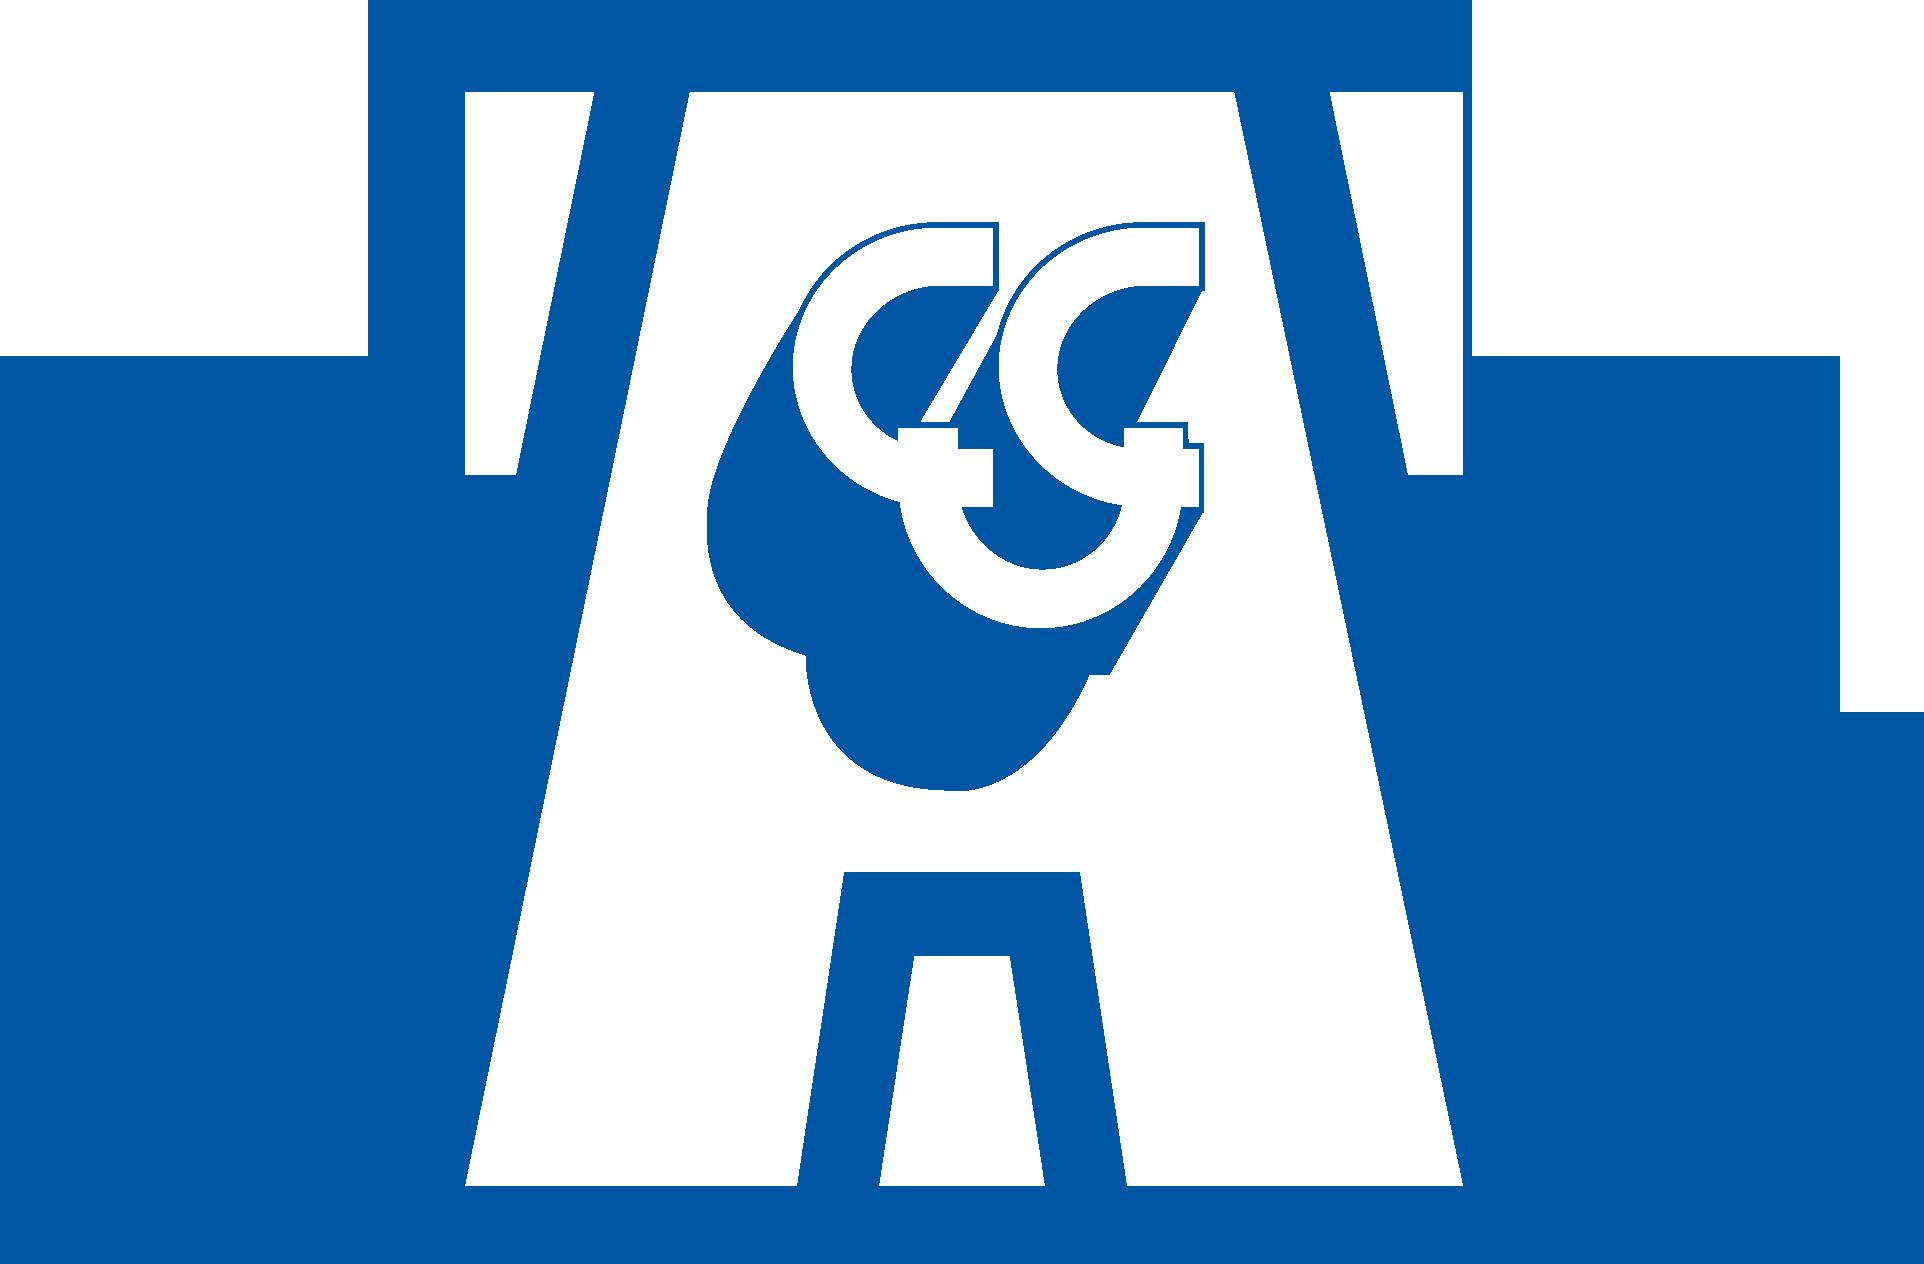 acosta logo blue.png